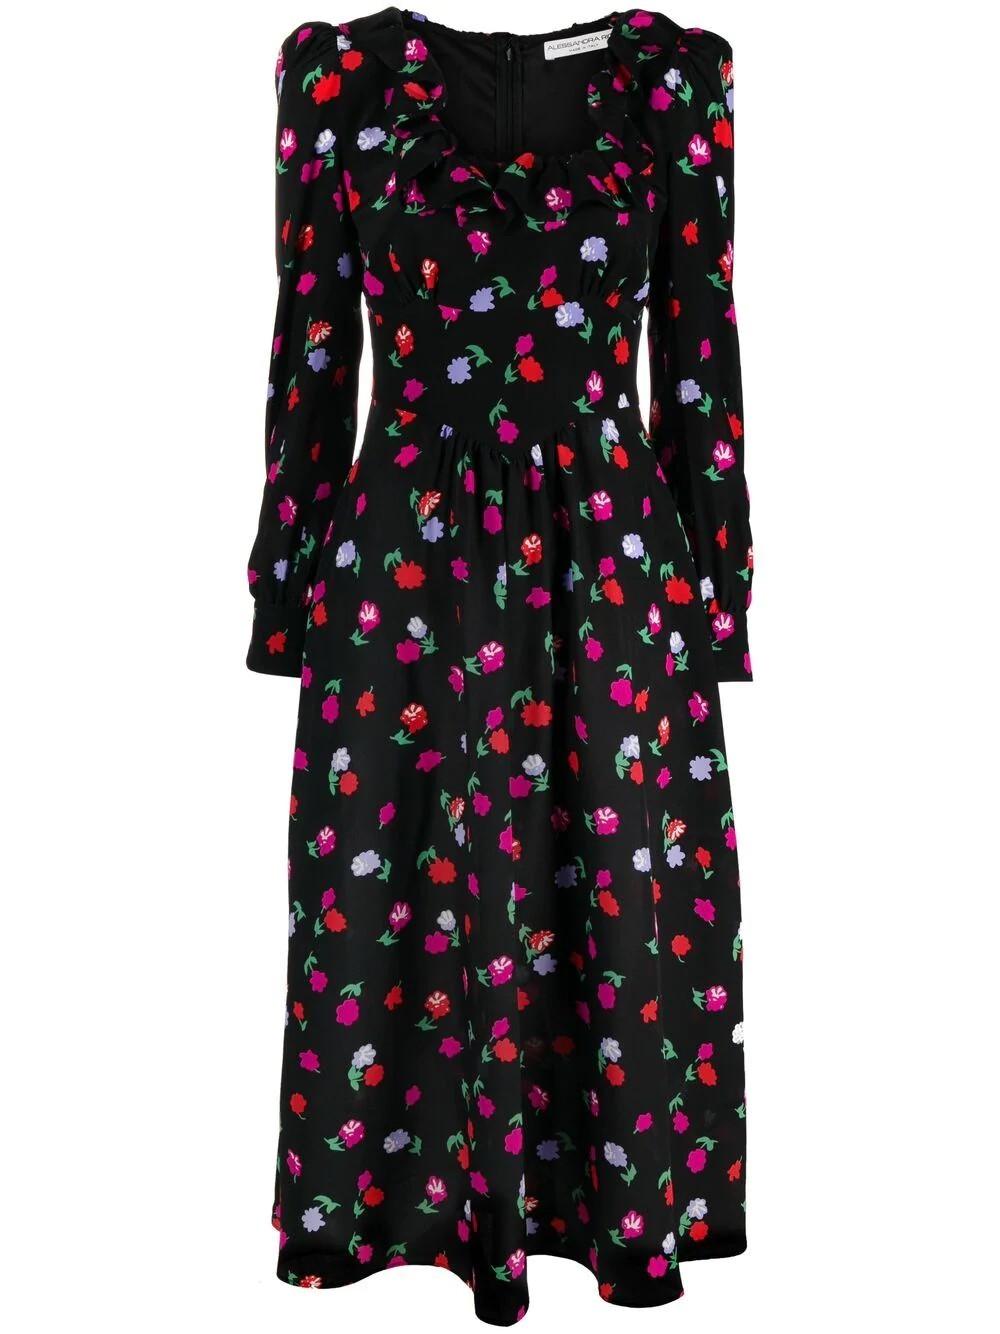 FLORAL PRINT SILK DRESS WITH RUFFLES